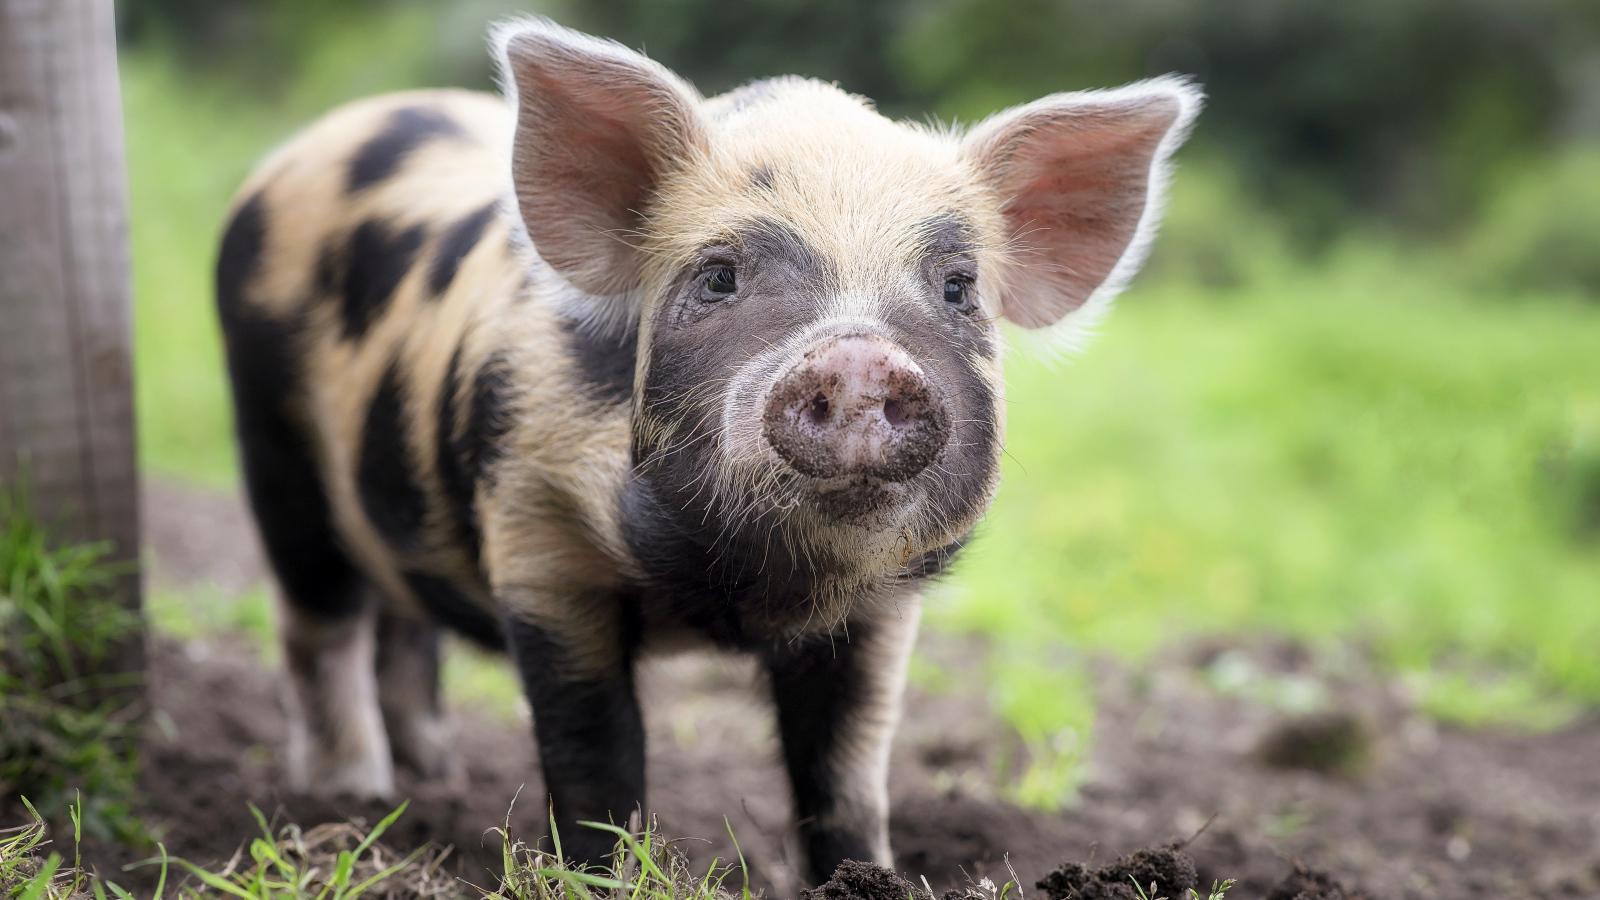 Funny Pig With A Dirty Pyatakom Desktop Wallpapers 1600x900